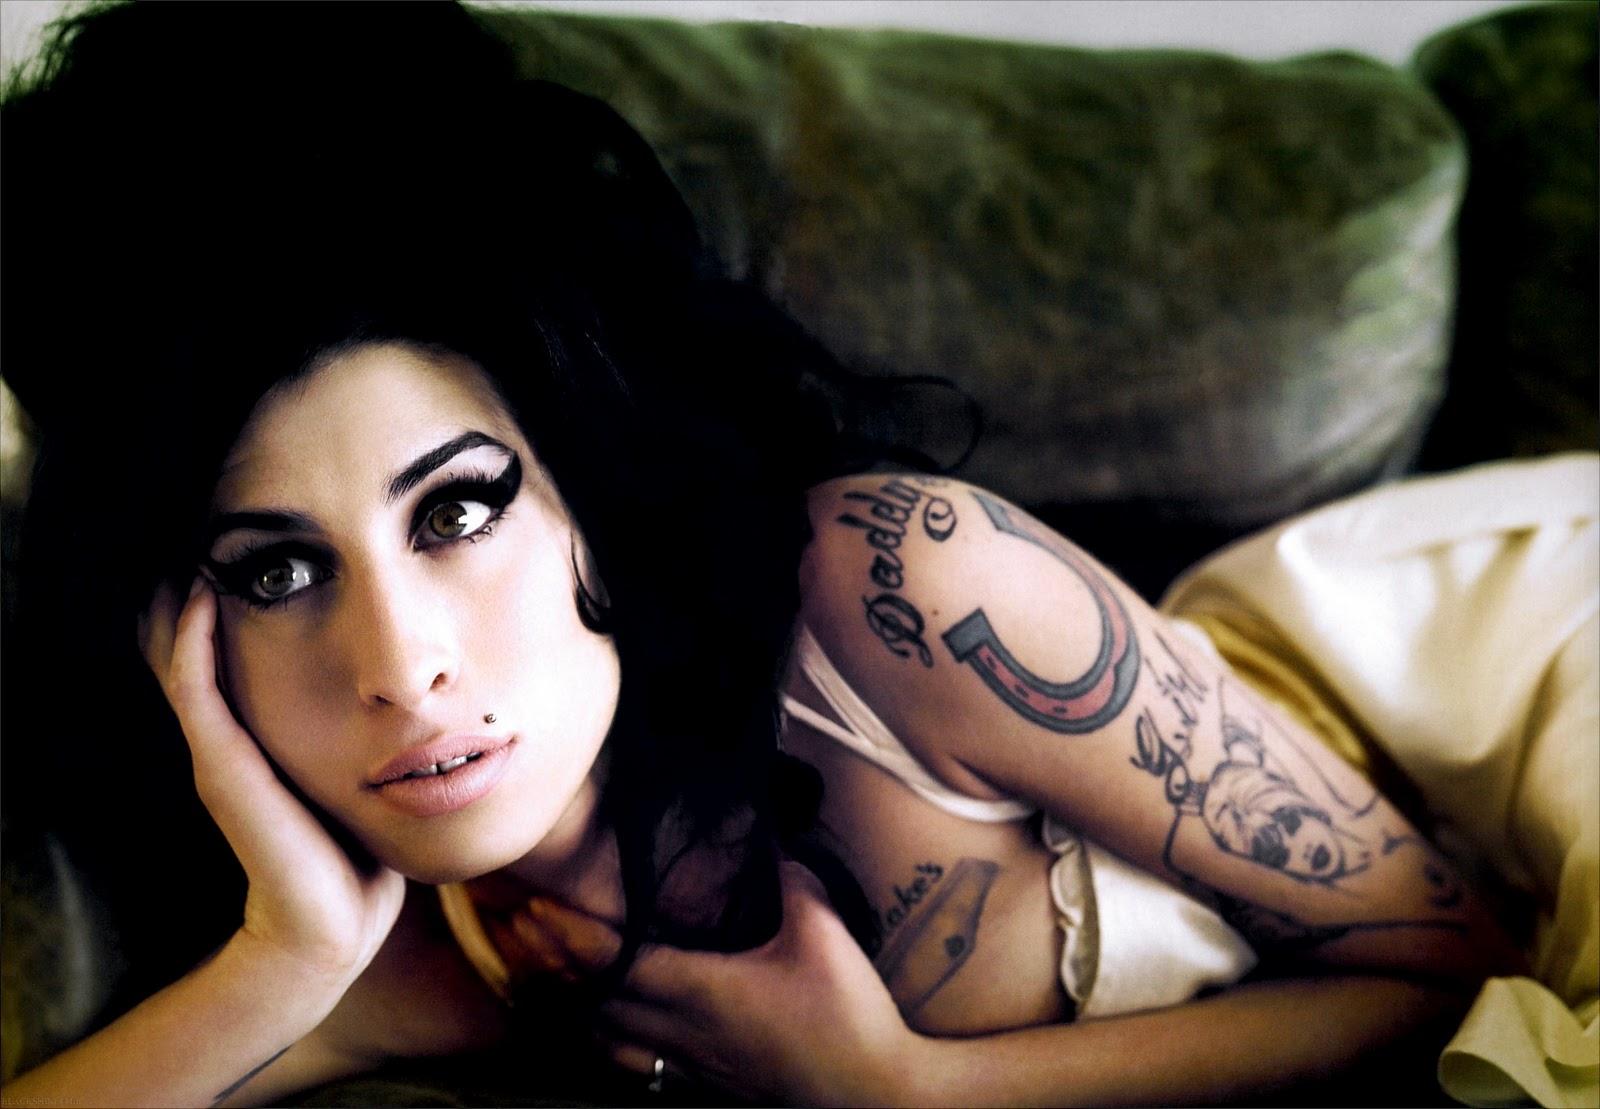 http://4.bp.blogspot.com/-zbuNwO9cml0/TrLMZDpqmtI/AAAAAAAAAQc/v-cm7PysVXw/s1600/Amy-Winehouse-Morre-Foto-Sensual-Nua.jpg